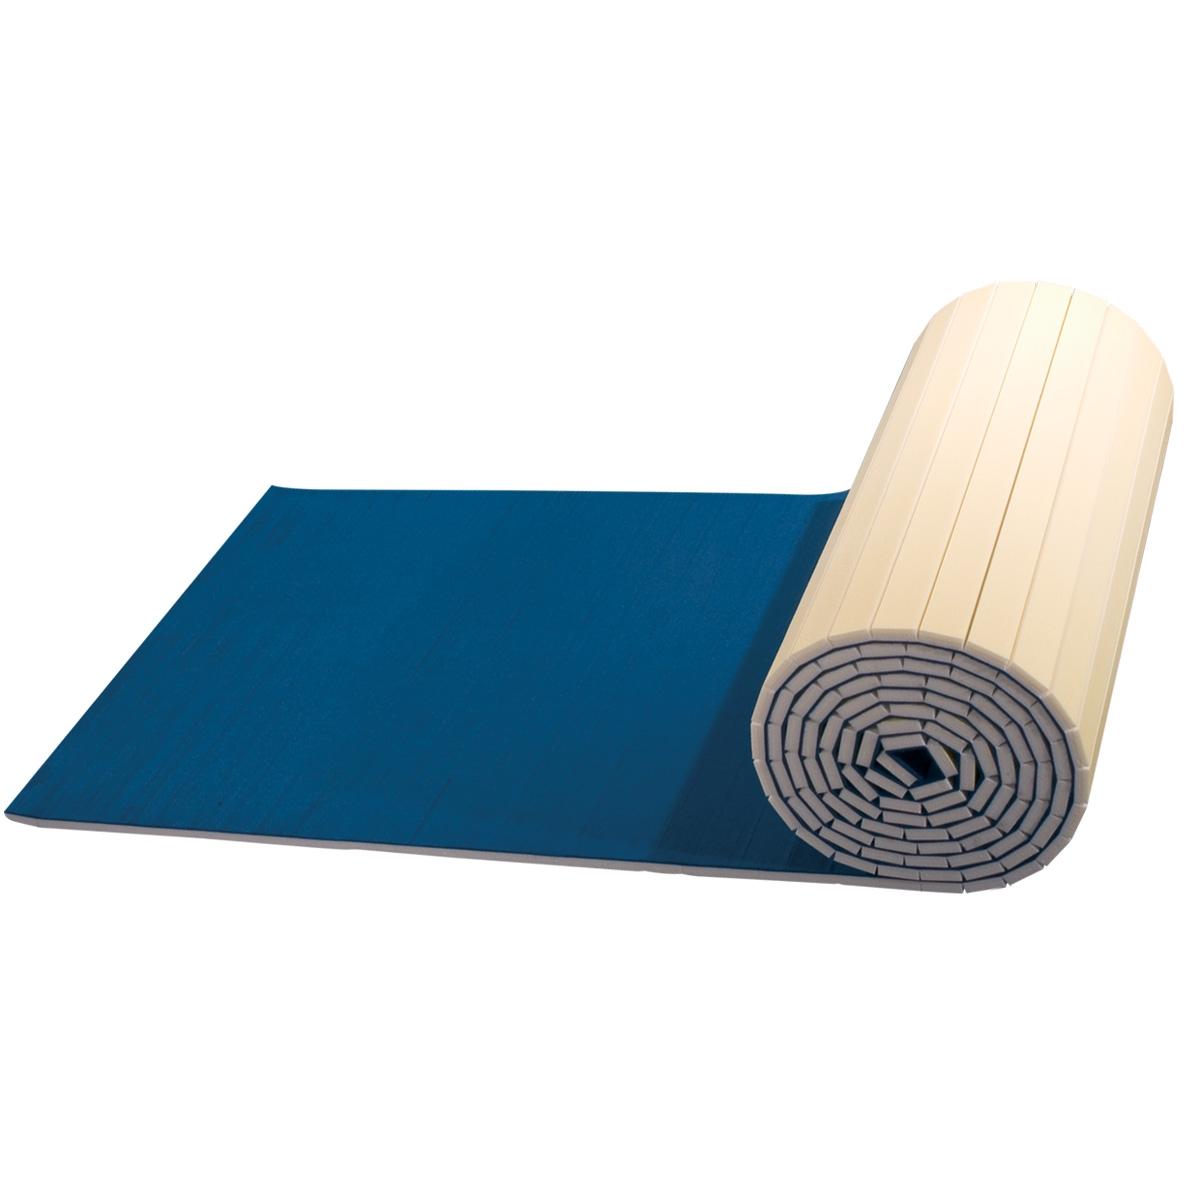 carpeted foam roll for cheer floors - mancino mats